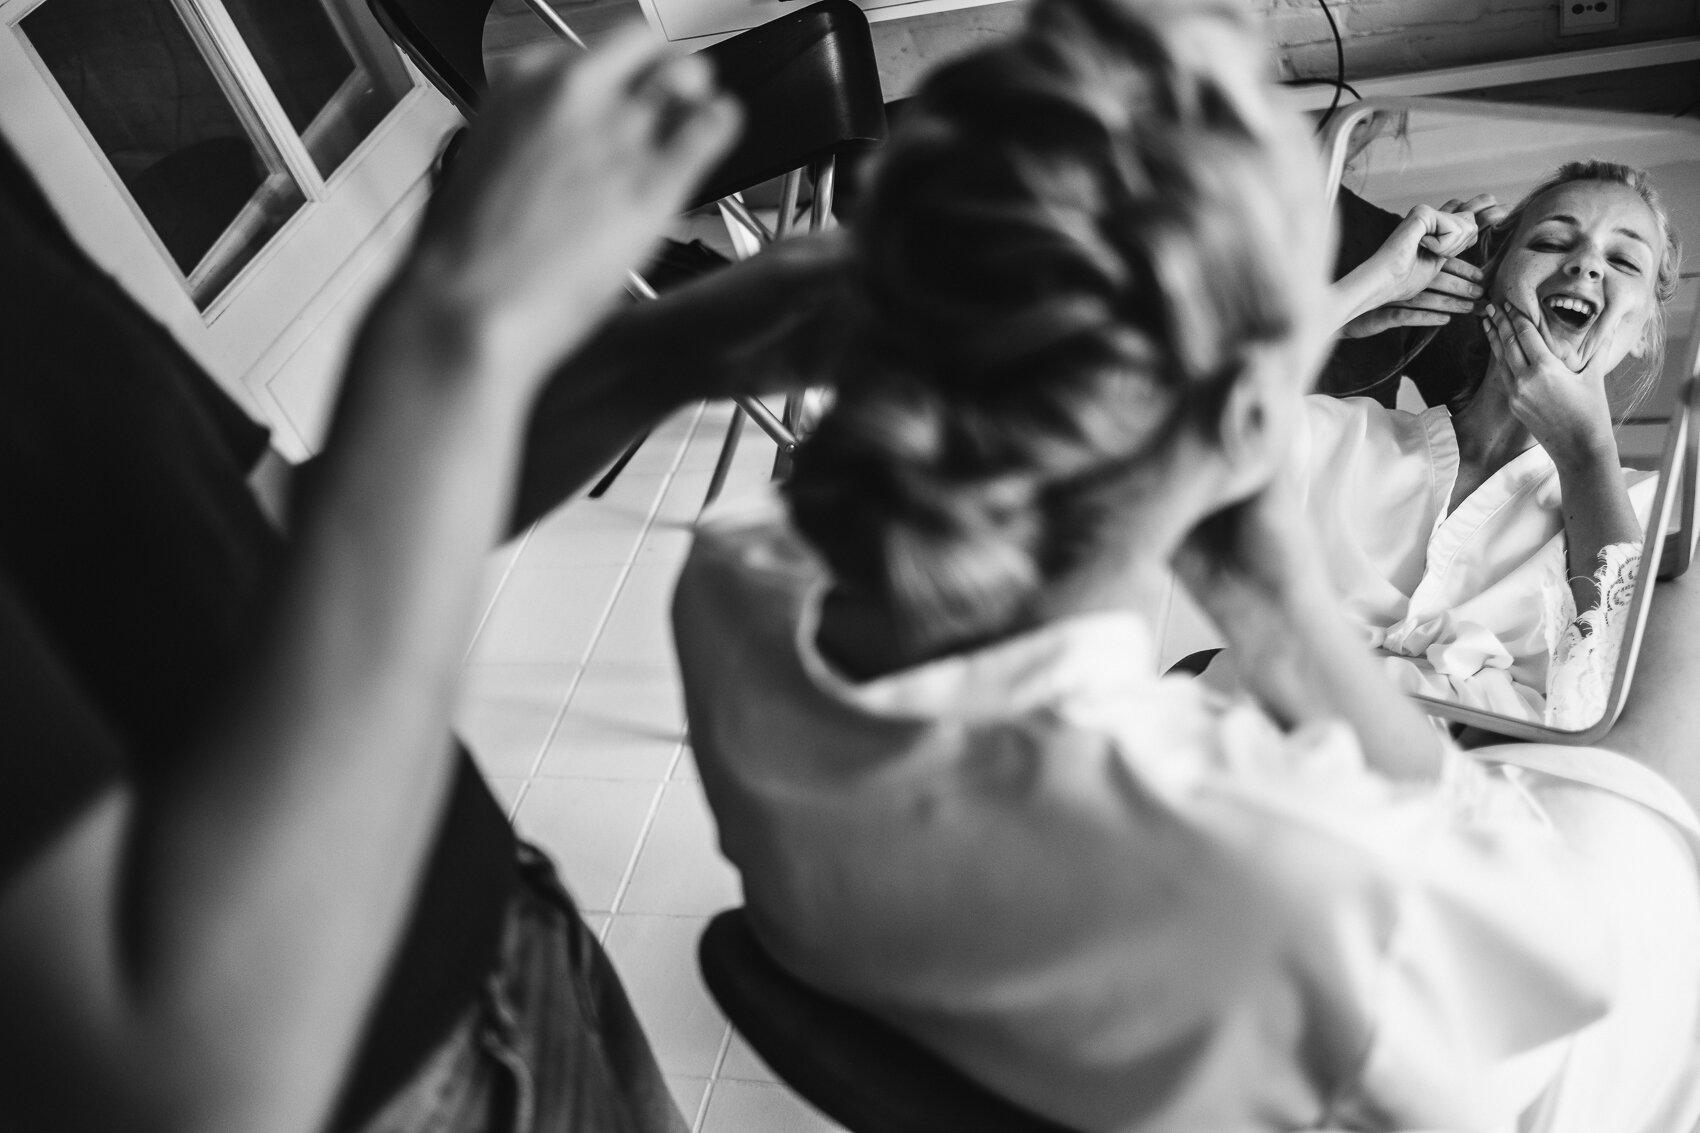 iso800 - huwelijksfotograaf isabo matthias verbeke foundation-2.jpg